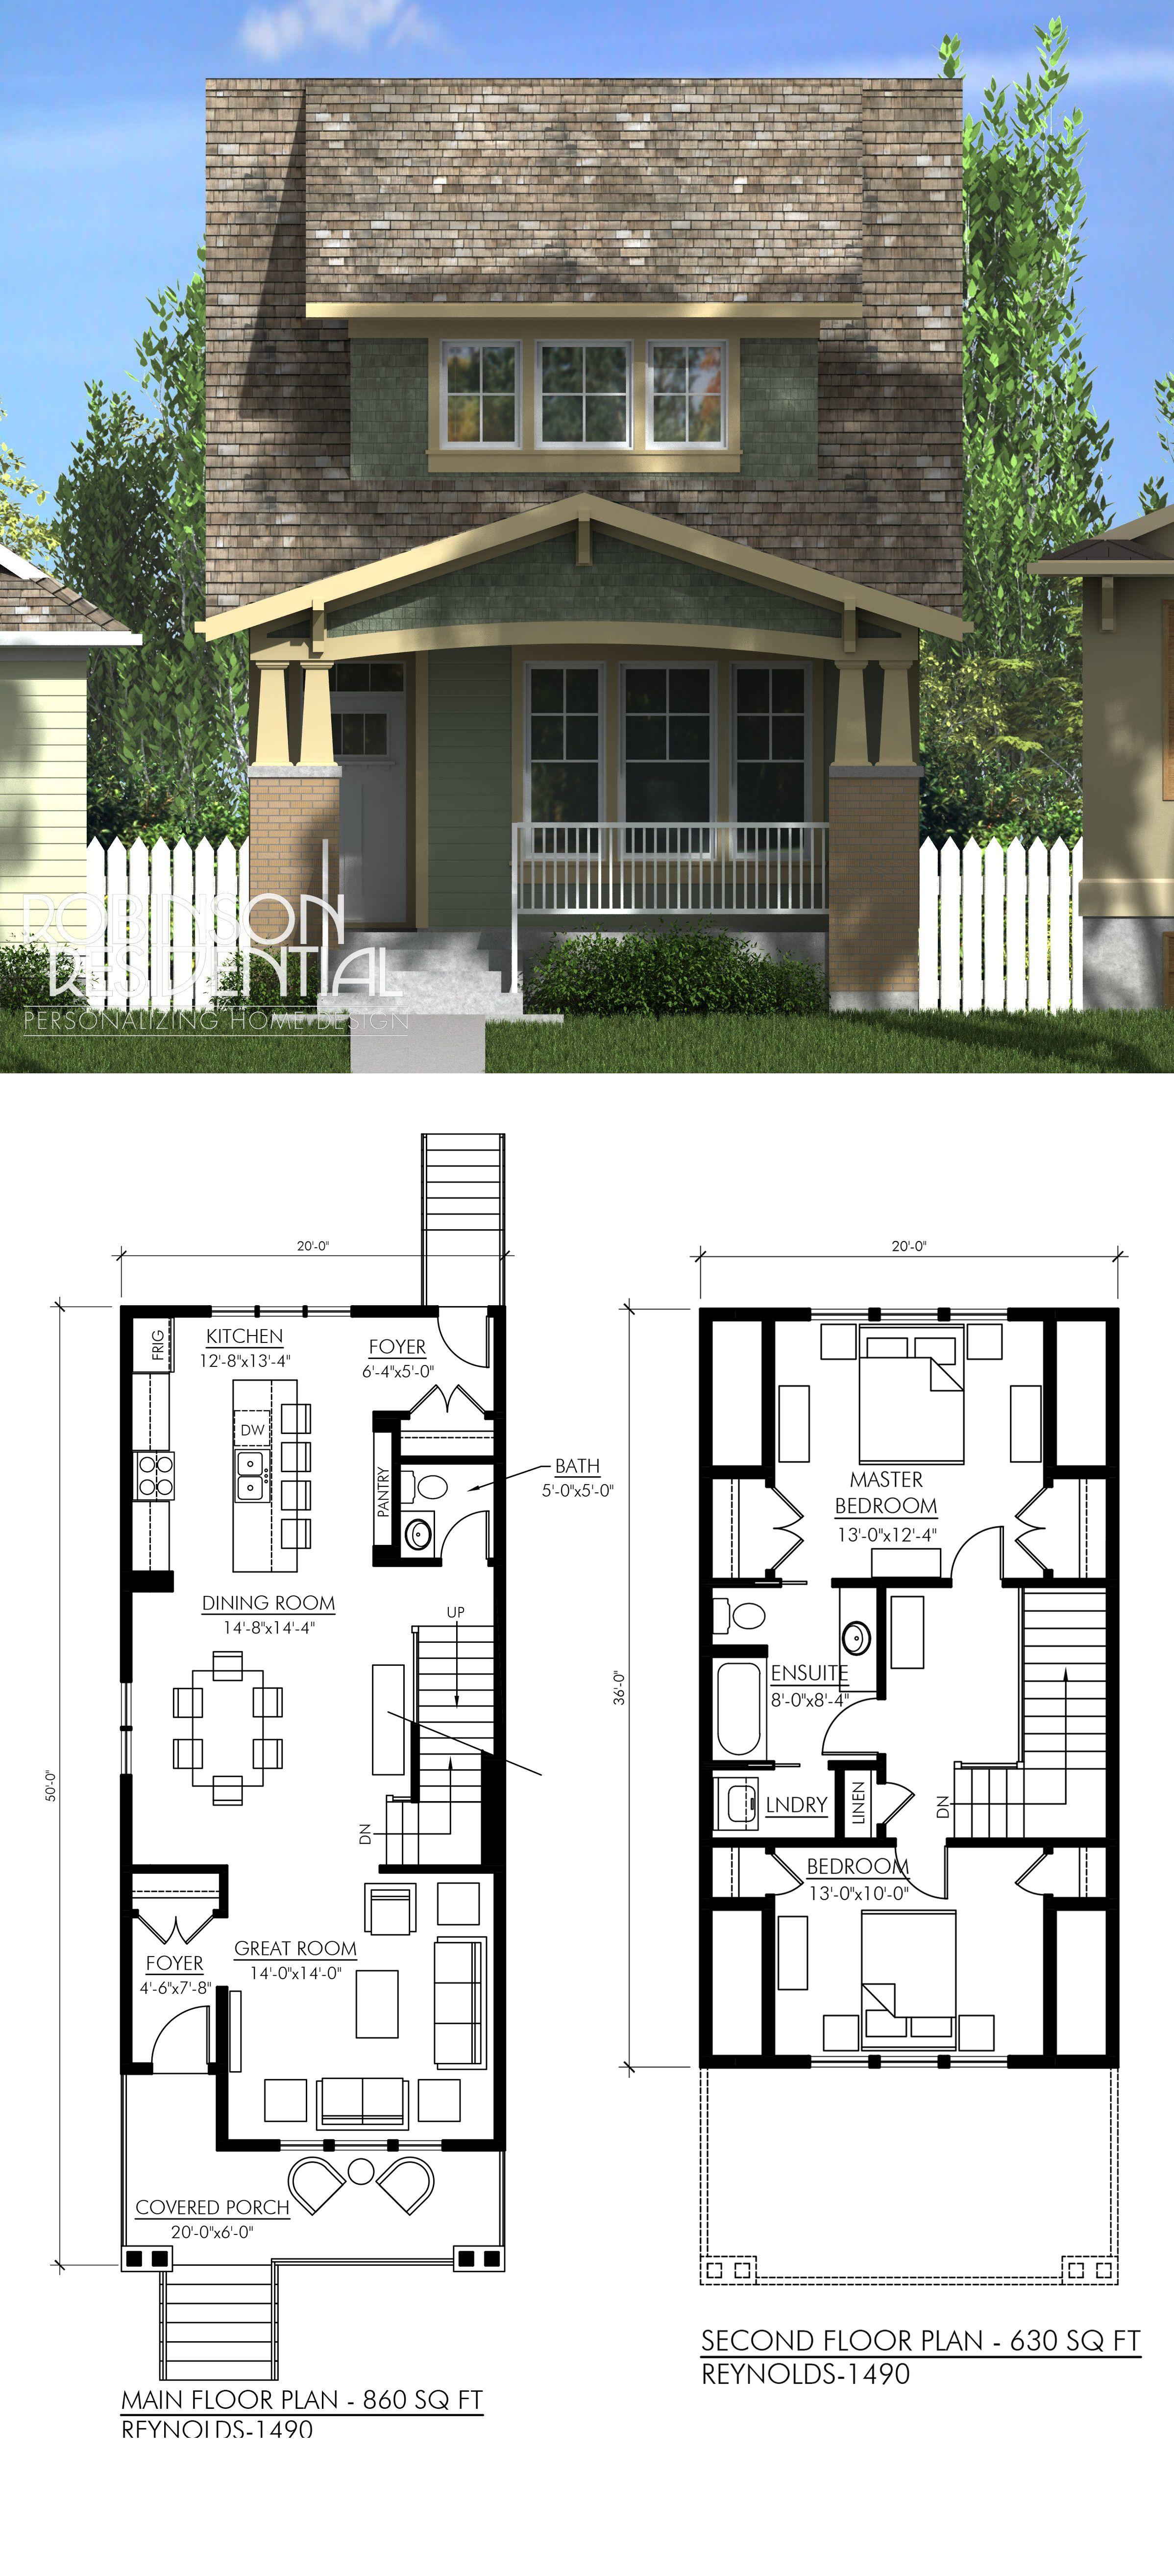 Craftsman Reynolds 1490 Robinson Plans Narrow House Plans New House Plans Narrow Lot House Plans